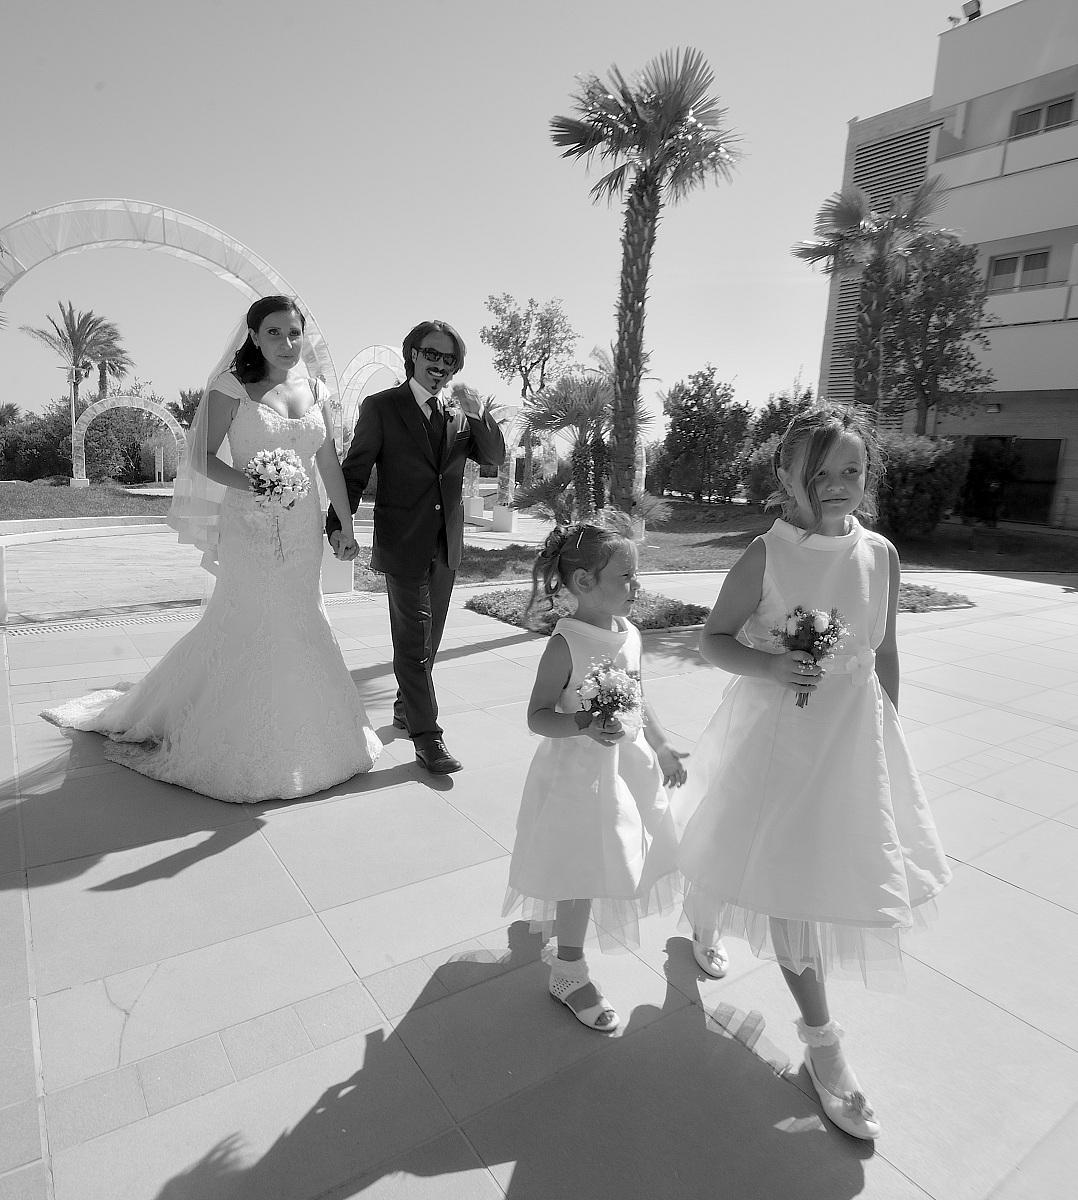 Three brides!?...